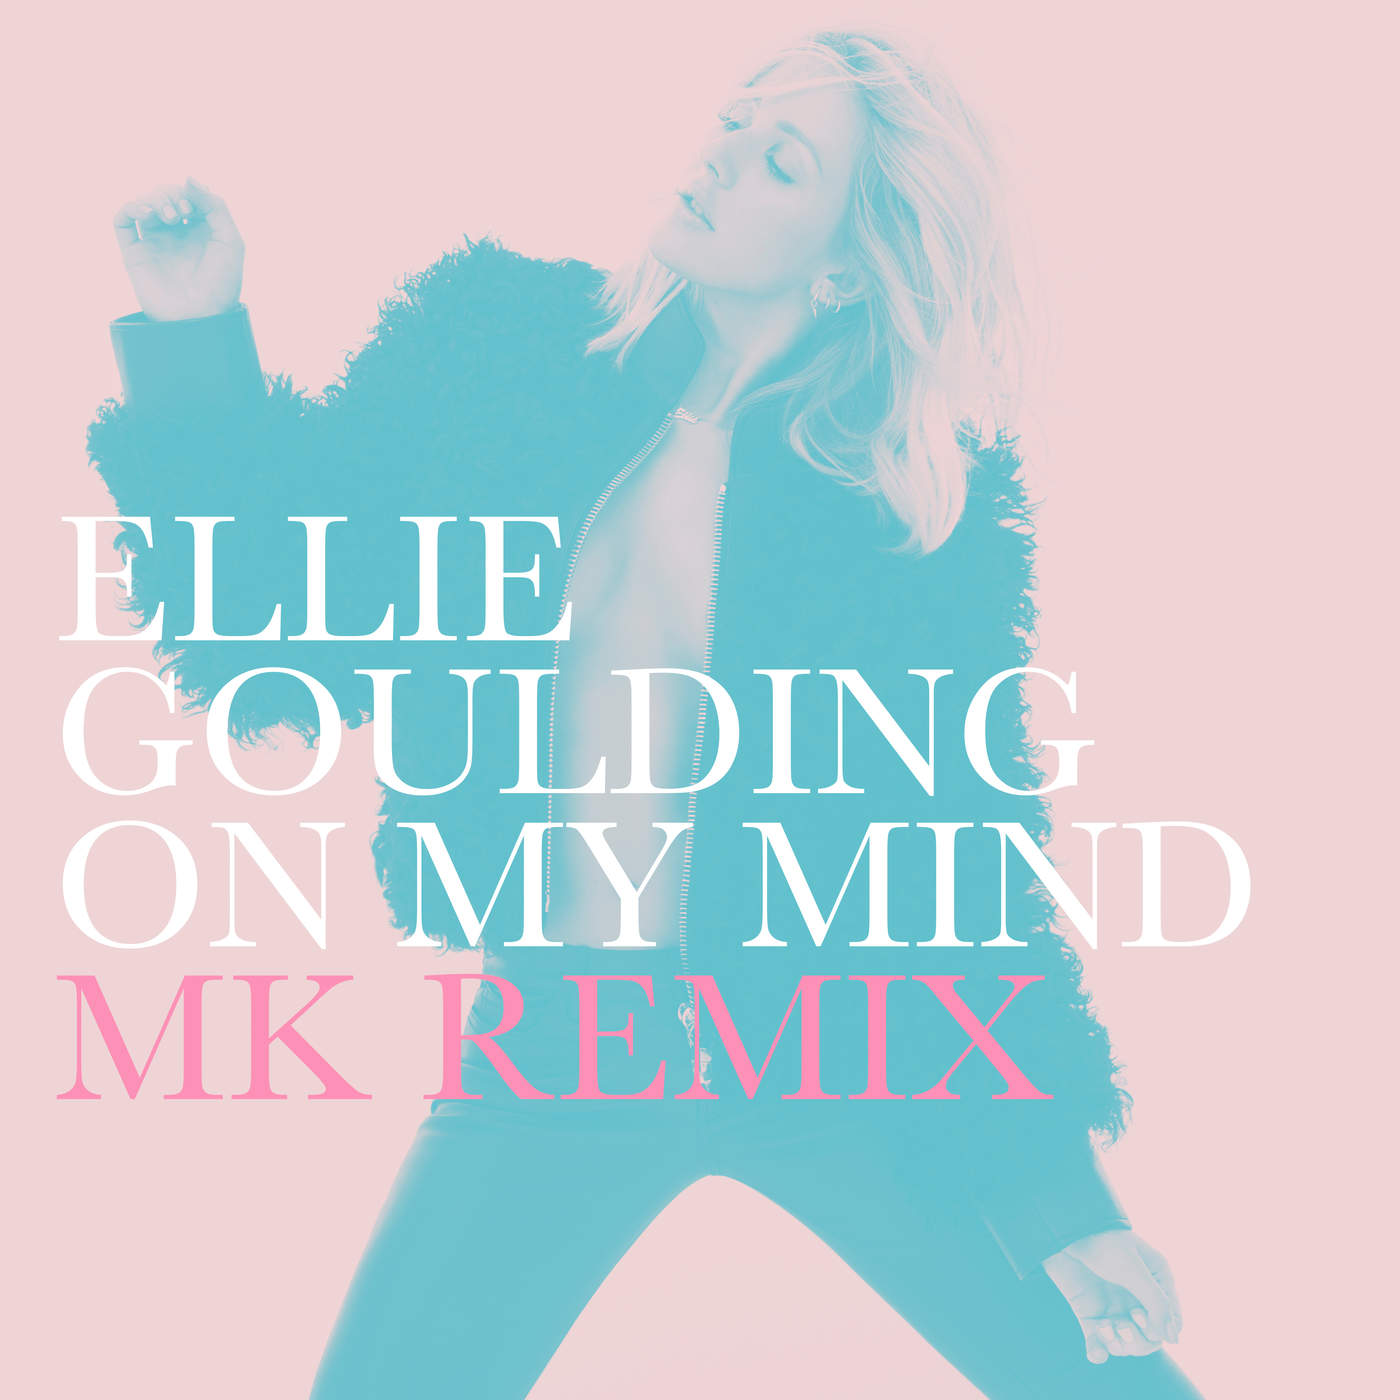 Ellie Goulding - On My Mind (MK Remix) - Single Cover